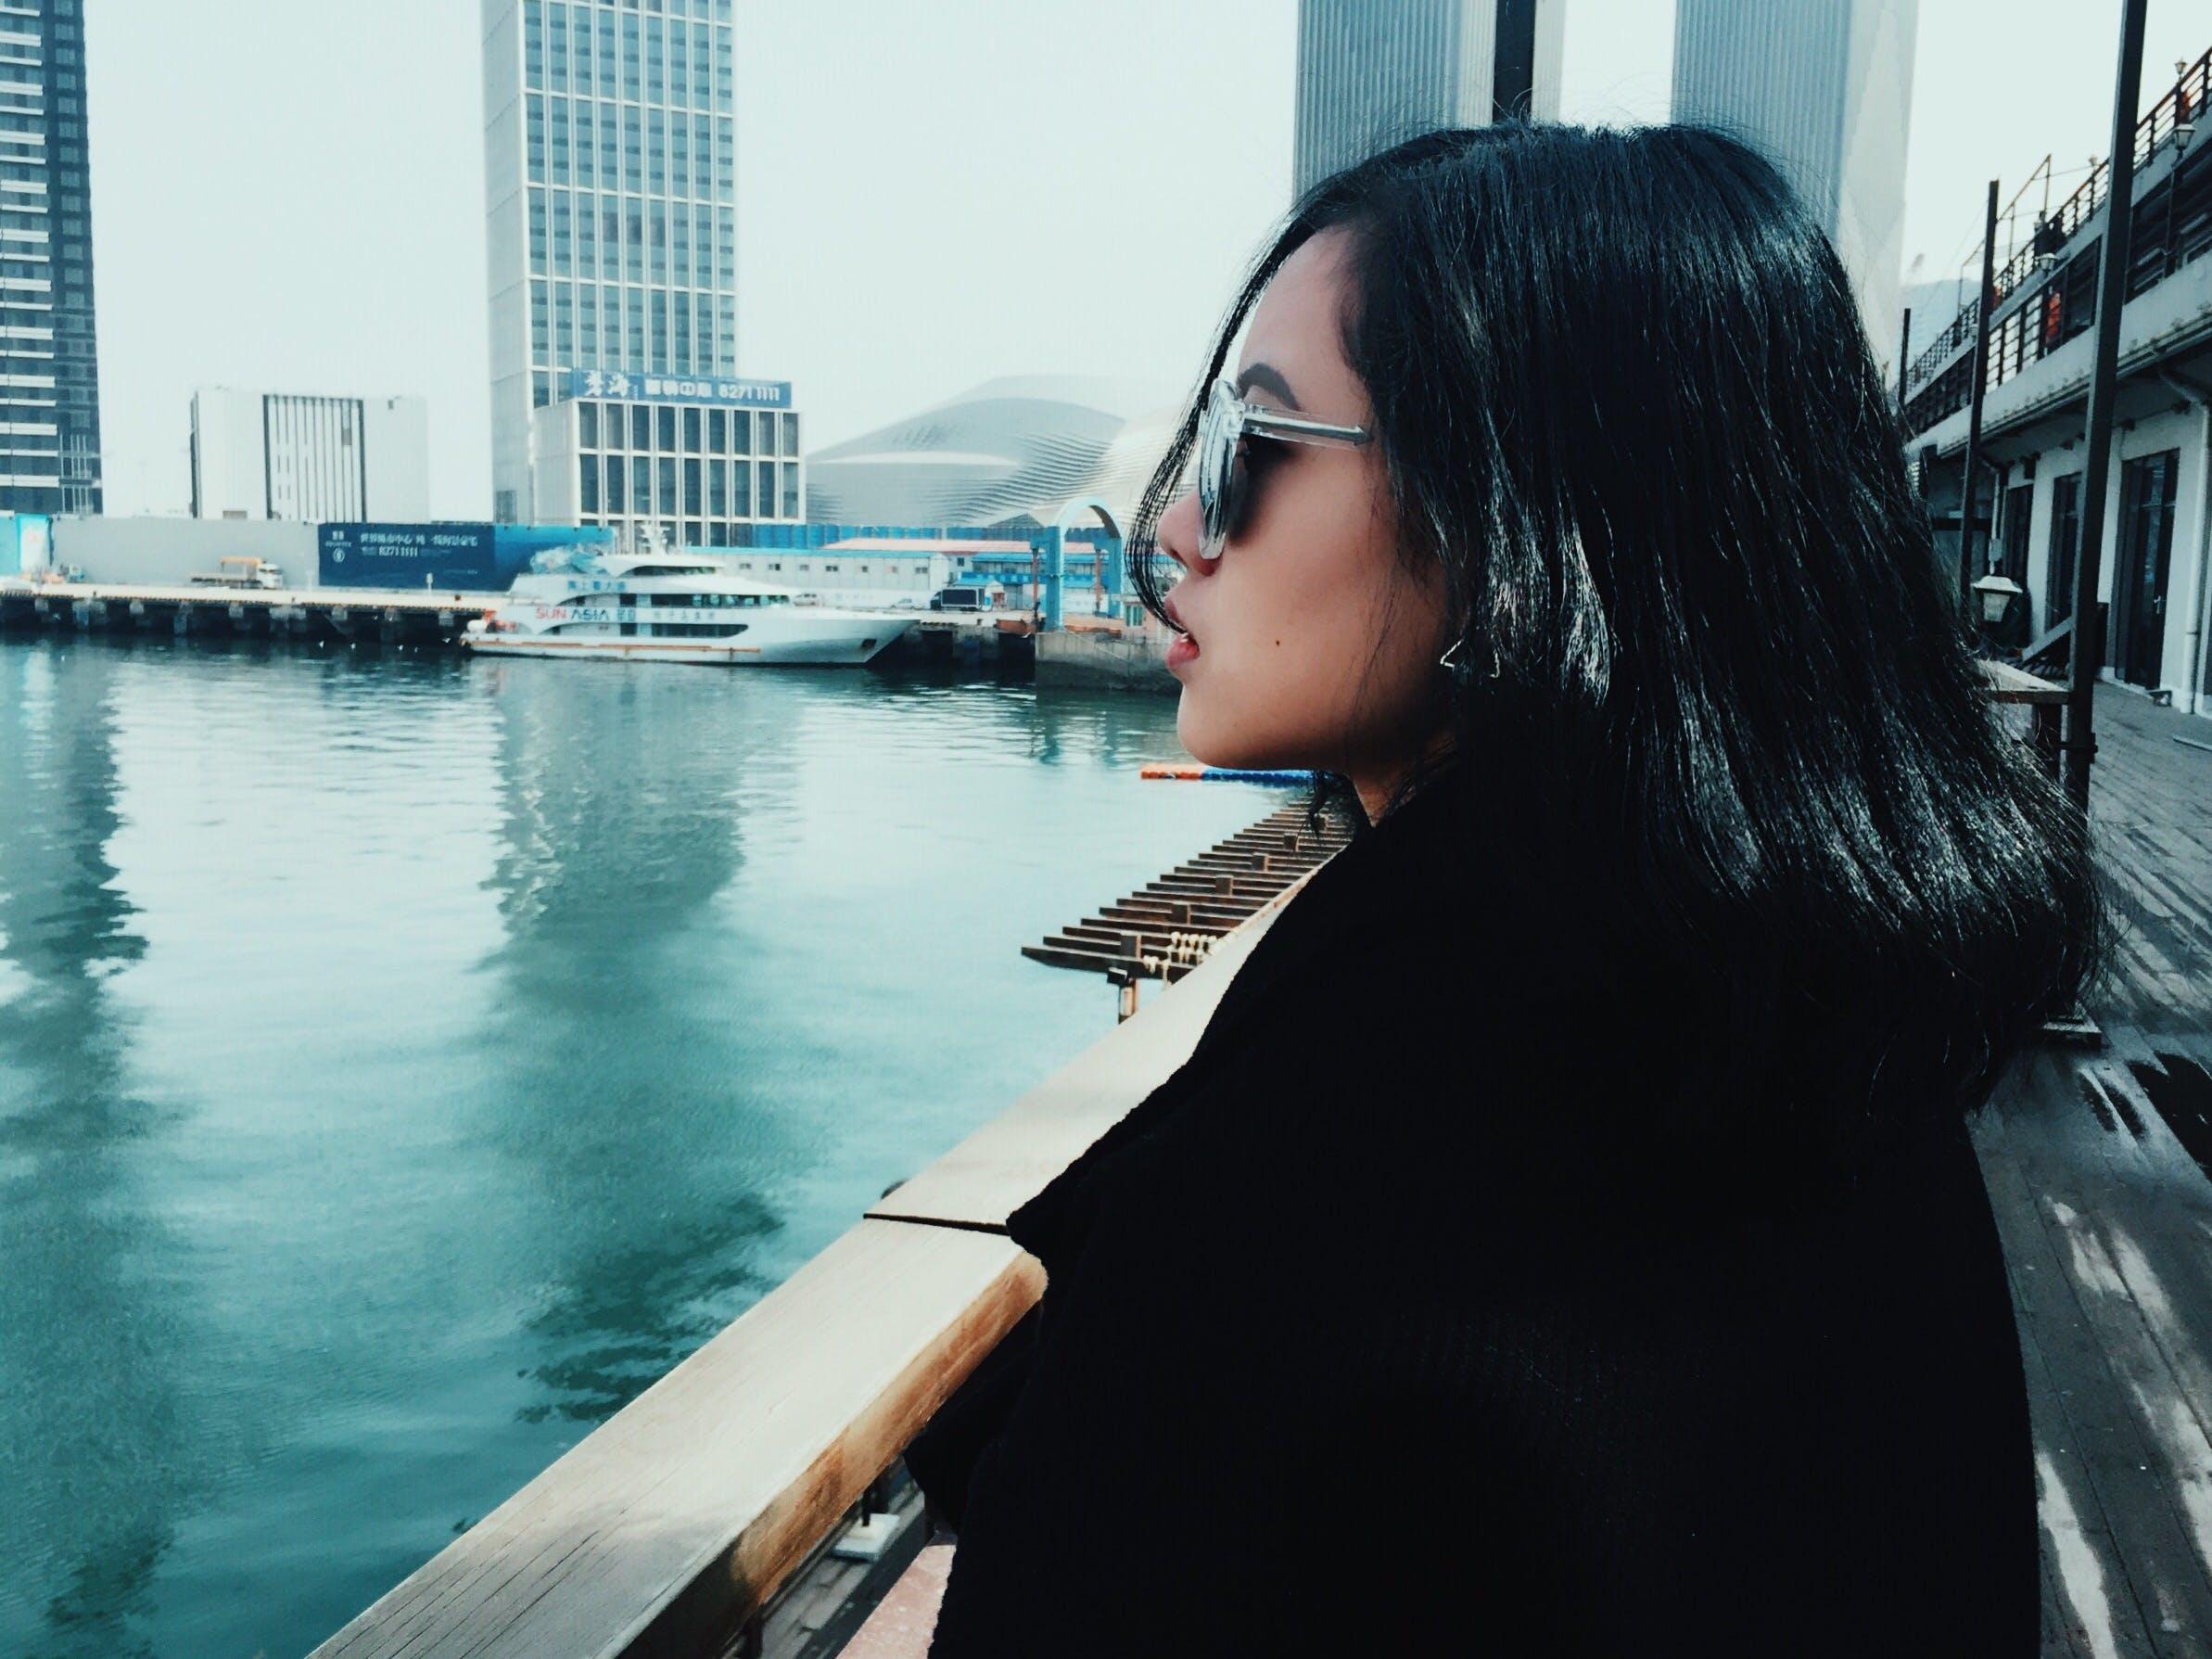 Woman Wearing Sunglasses Looking Towards Body of Water